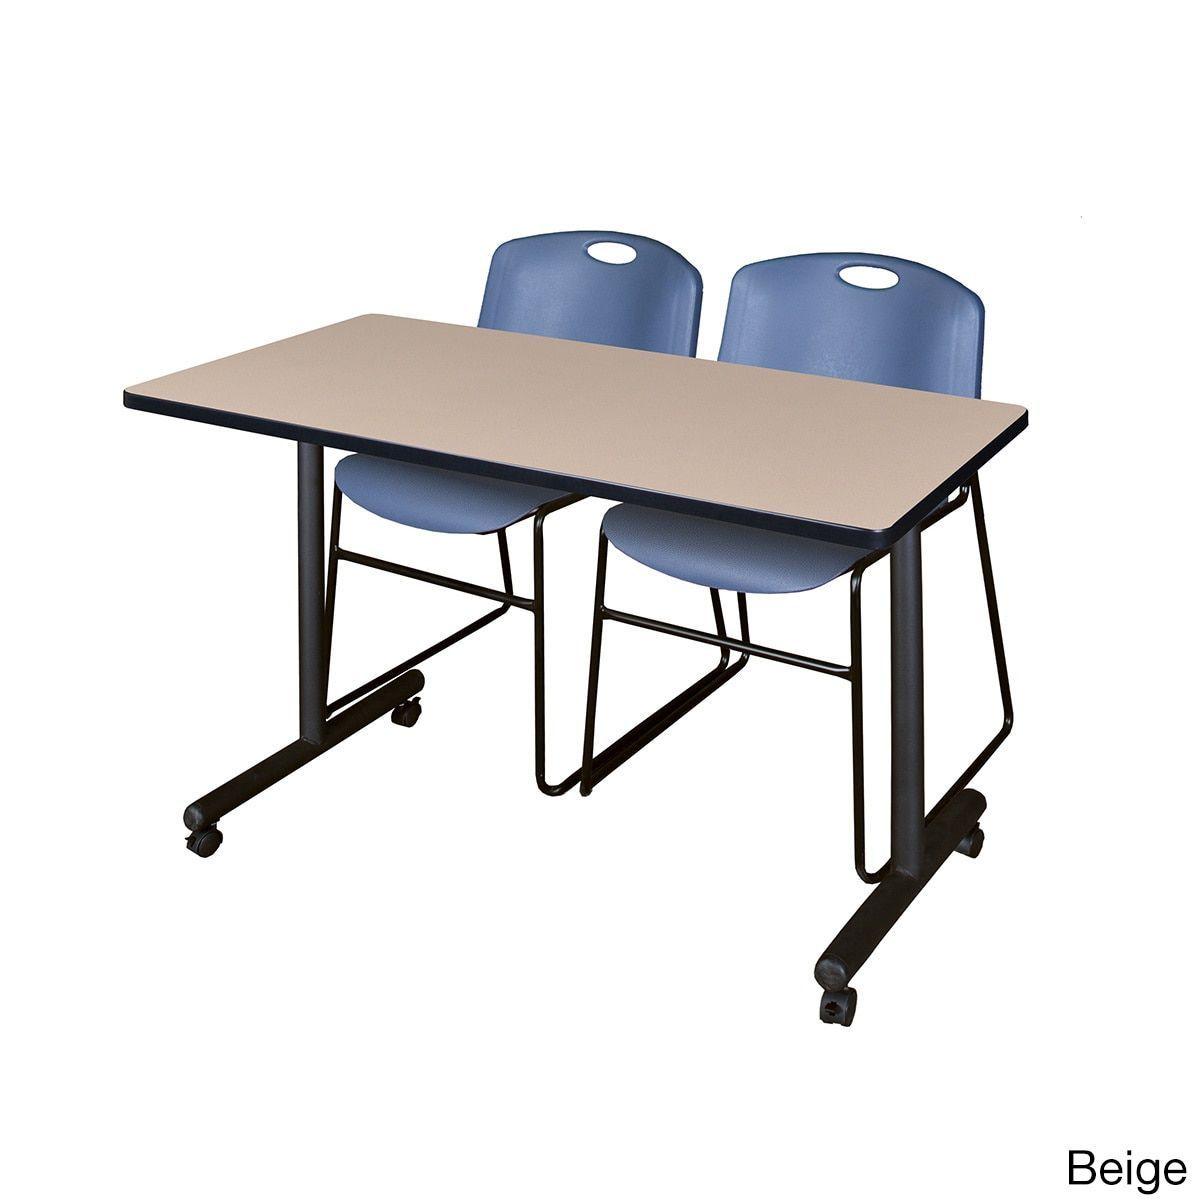 Office folding tables regency seating kobe mobile training table u  zeng blue stack